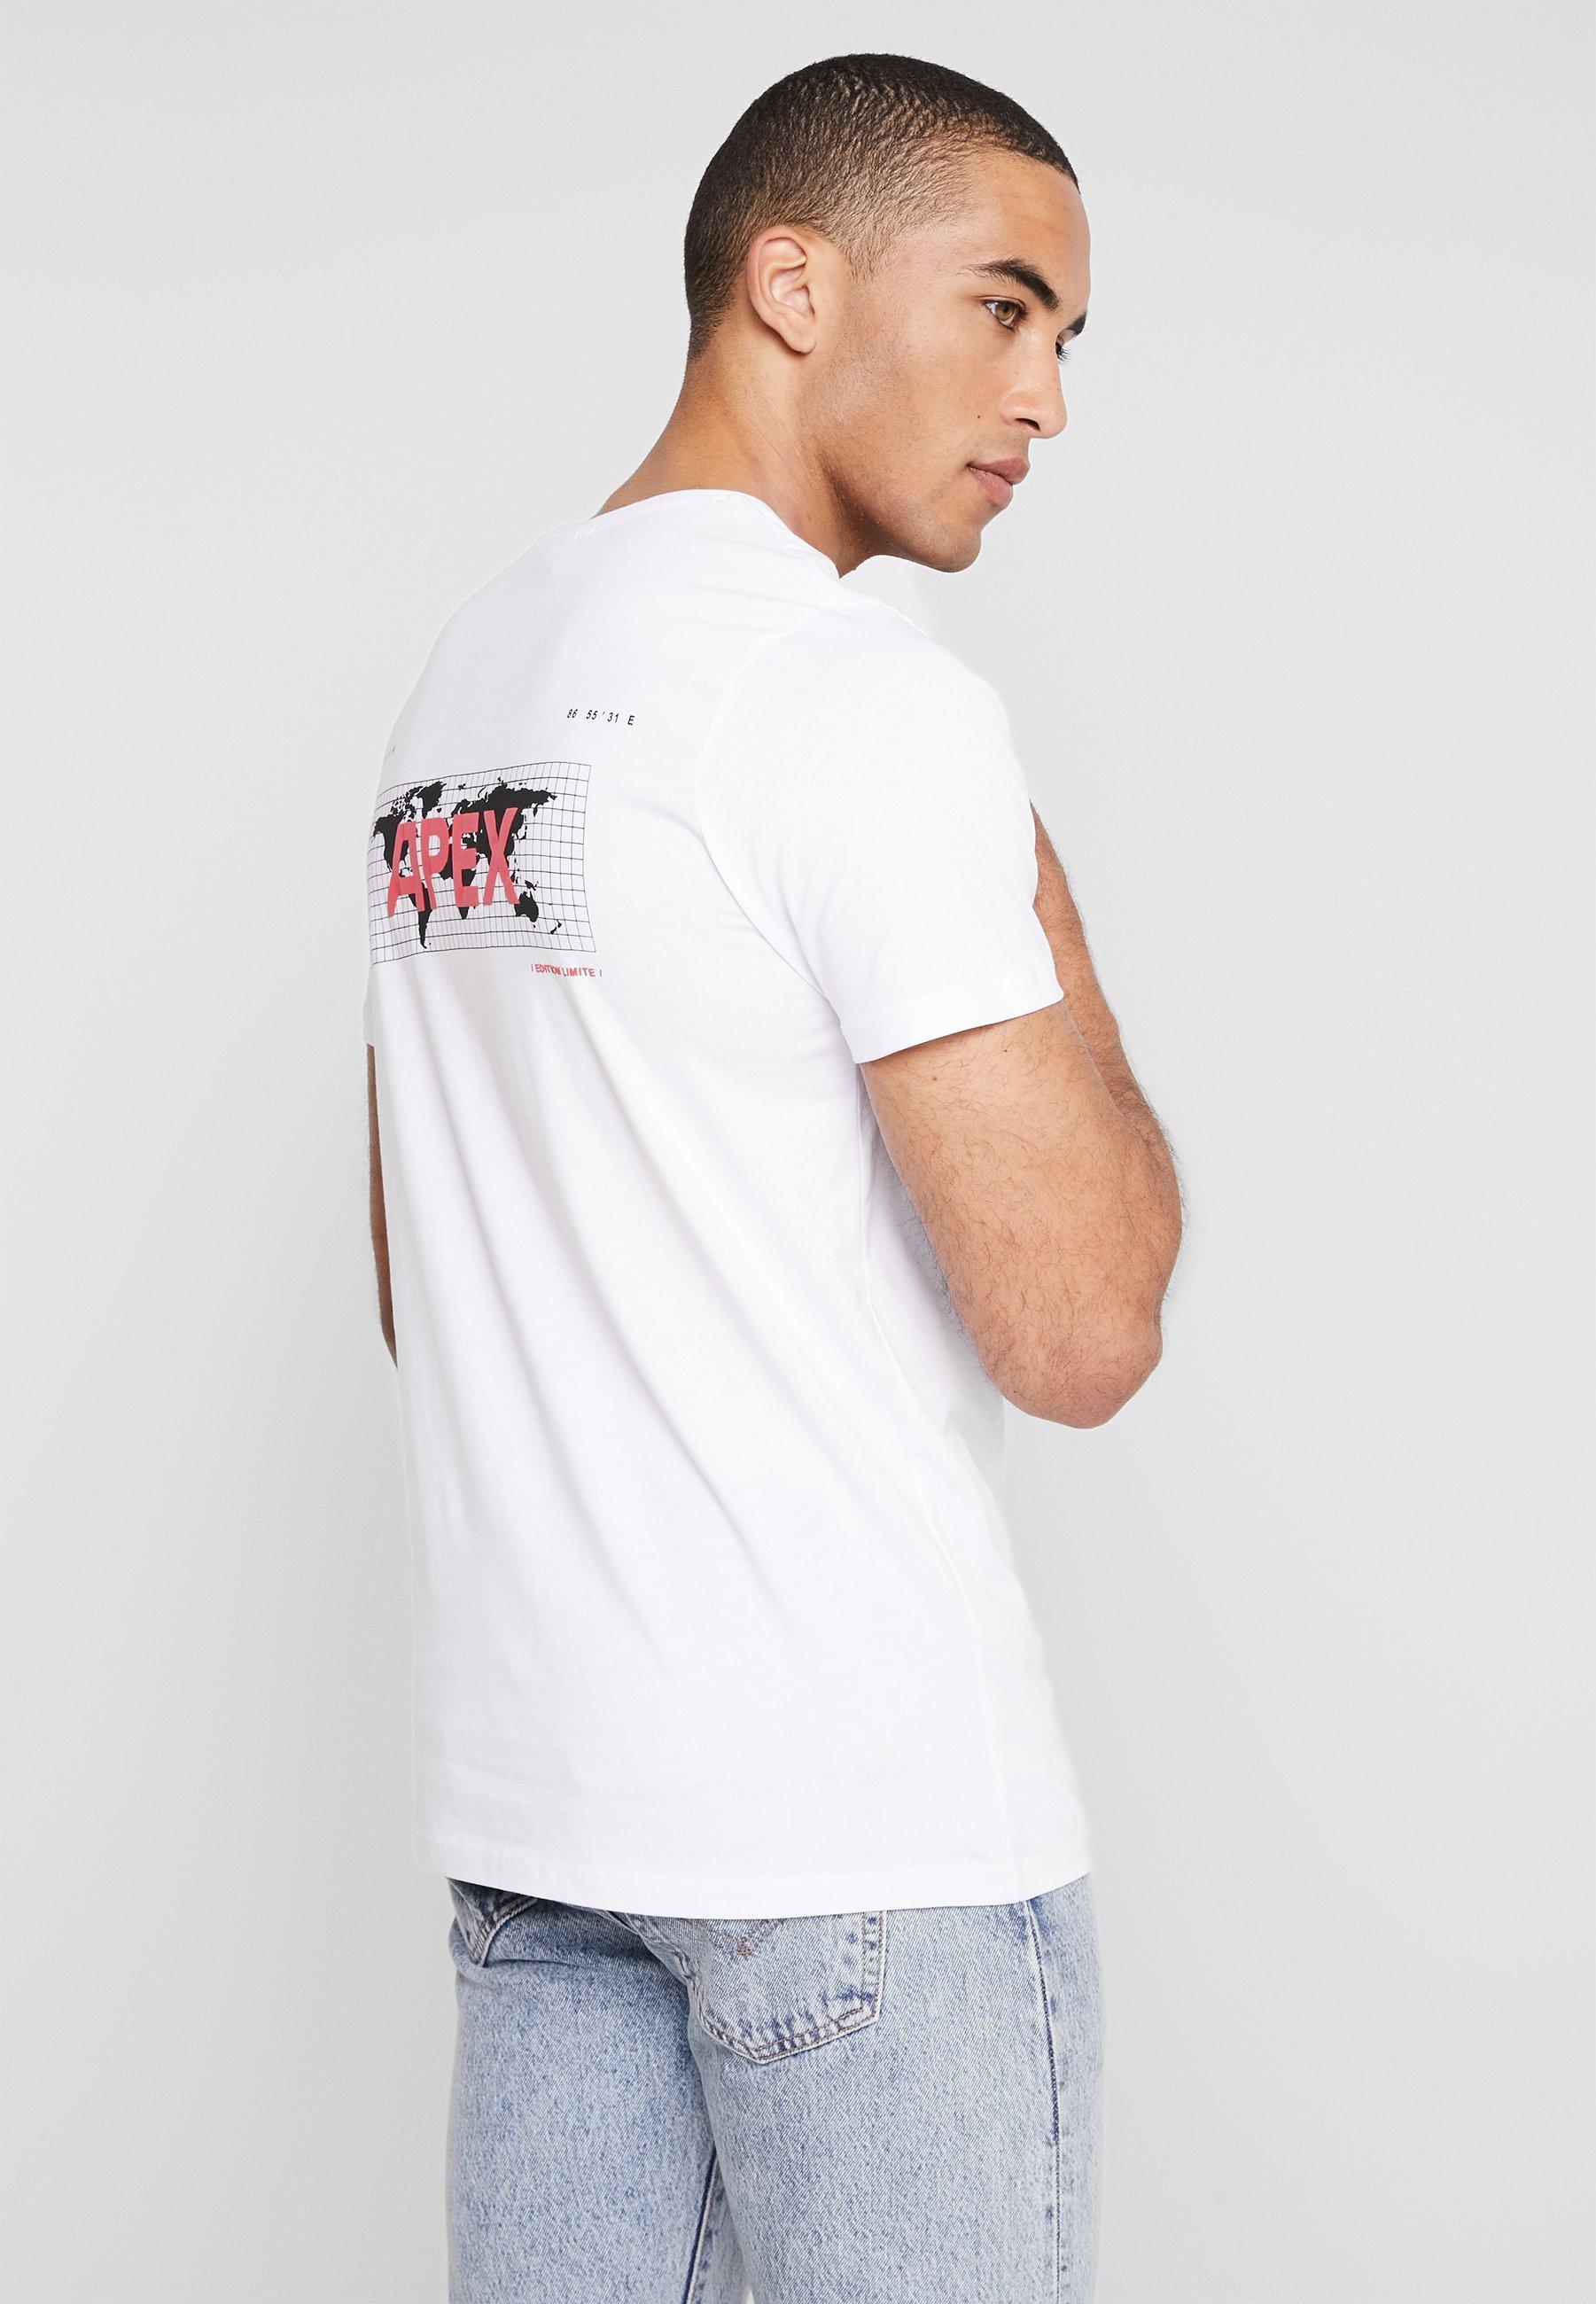 shirt NeckT Jackamp; Tee Crew Imprimé Jones Jcoapex White hrxBotdsQC